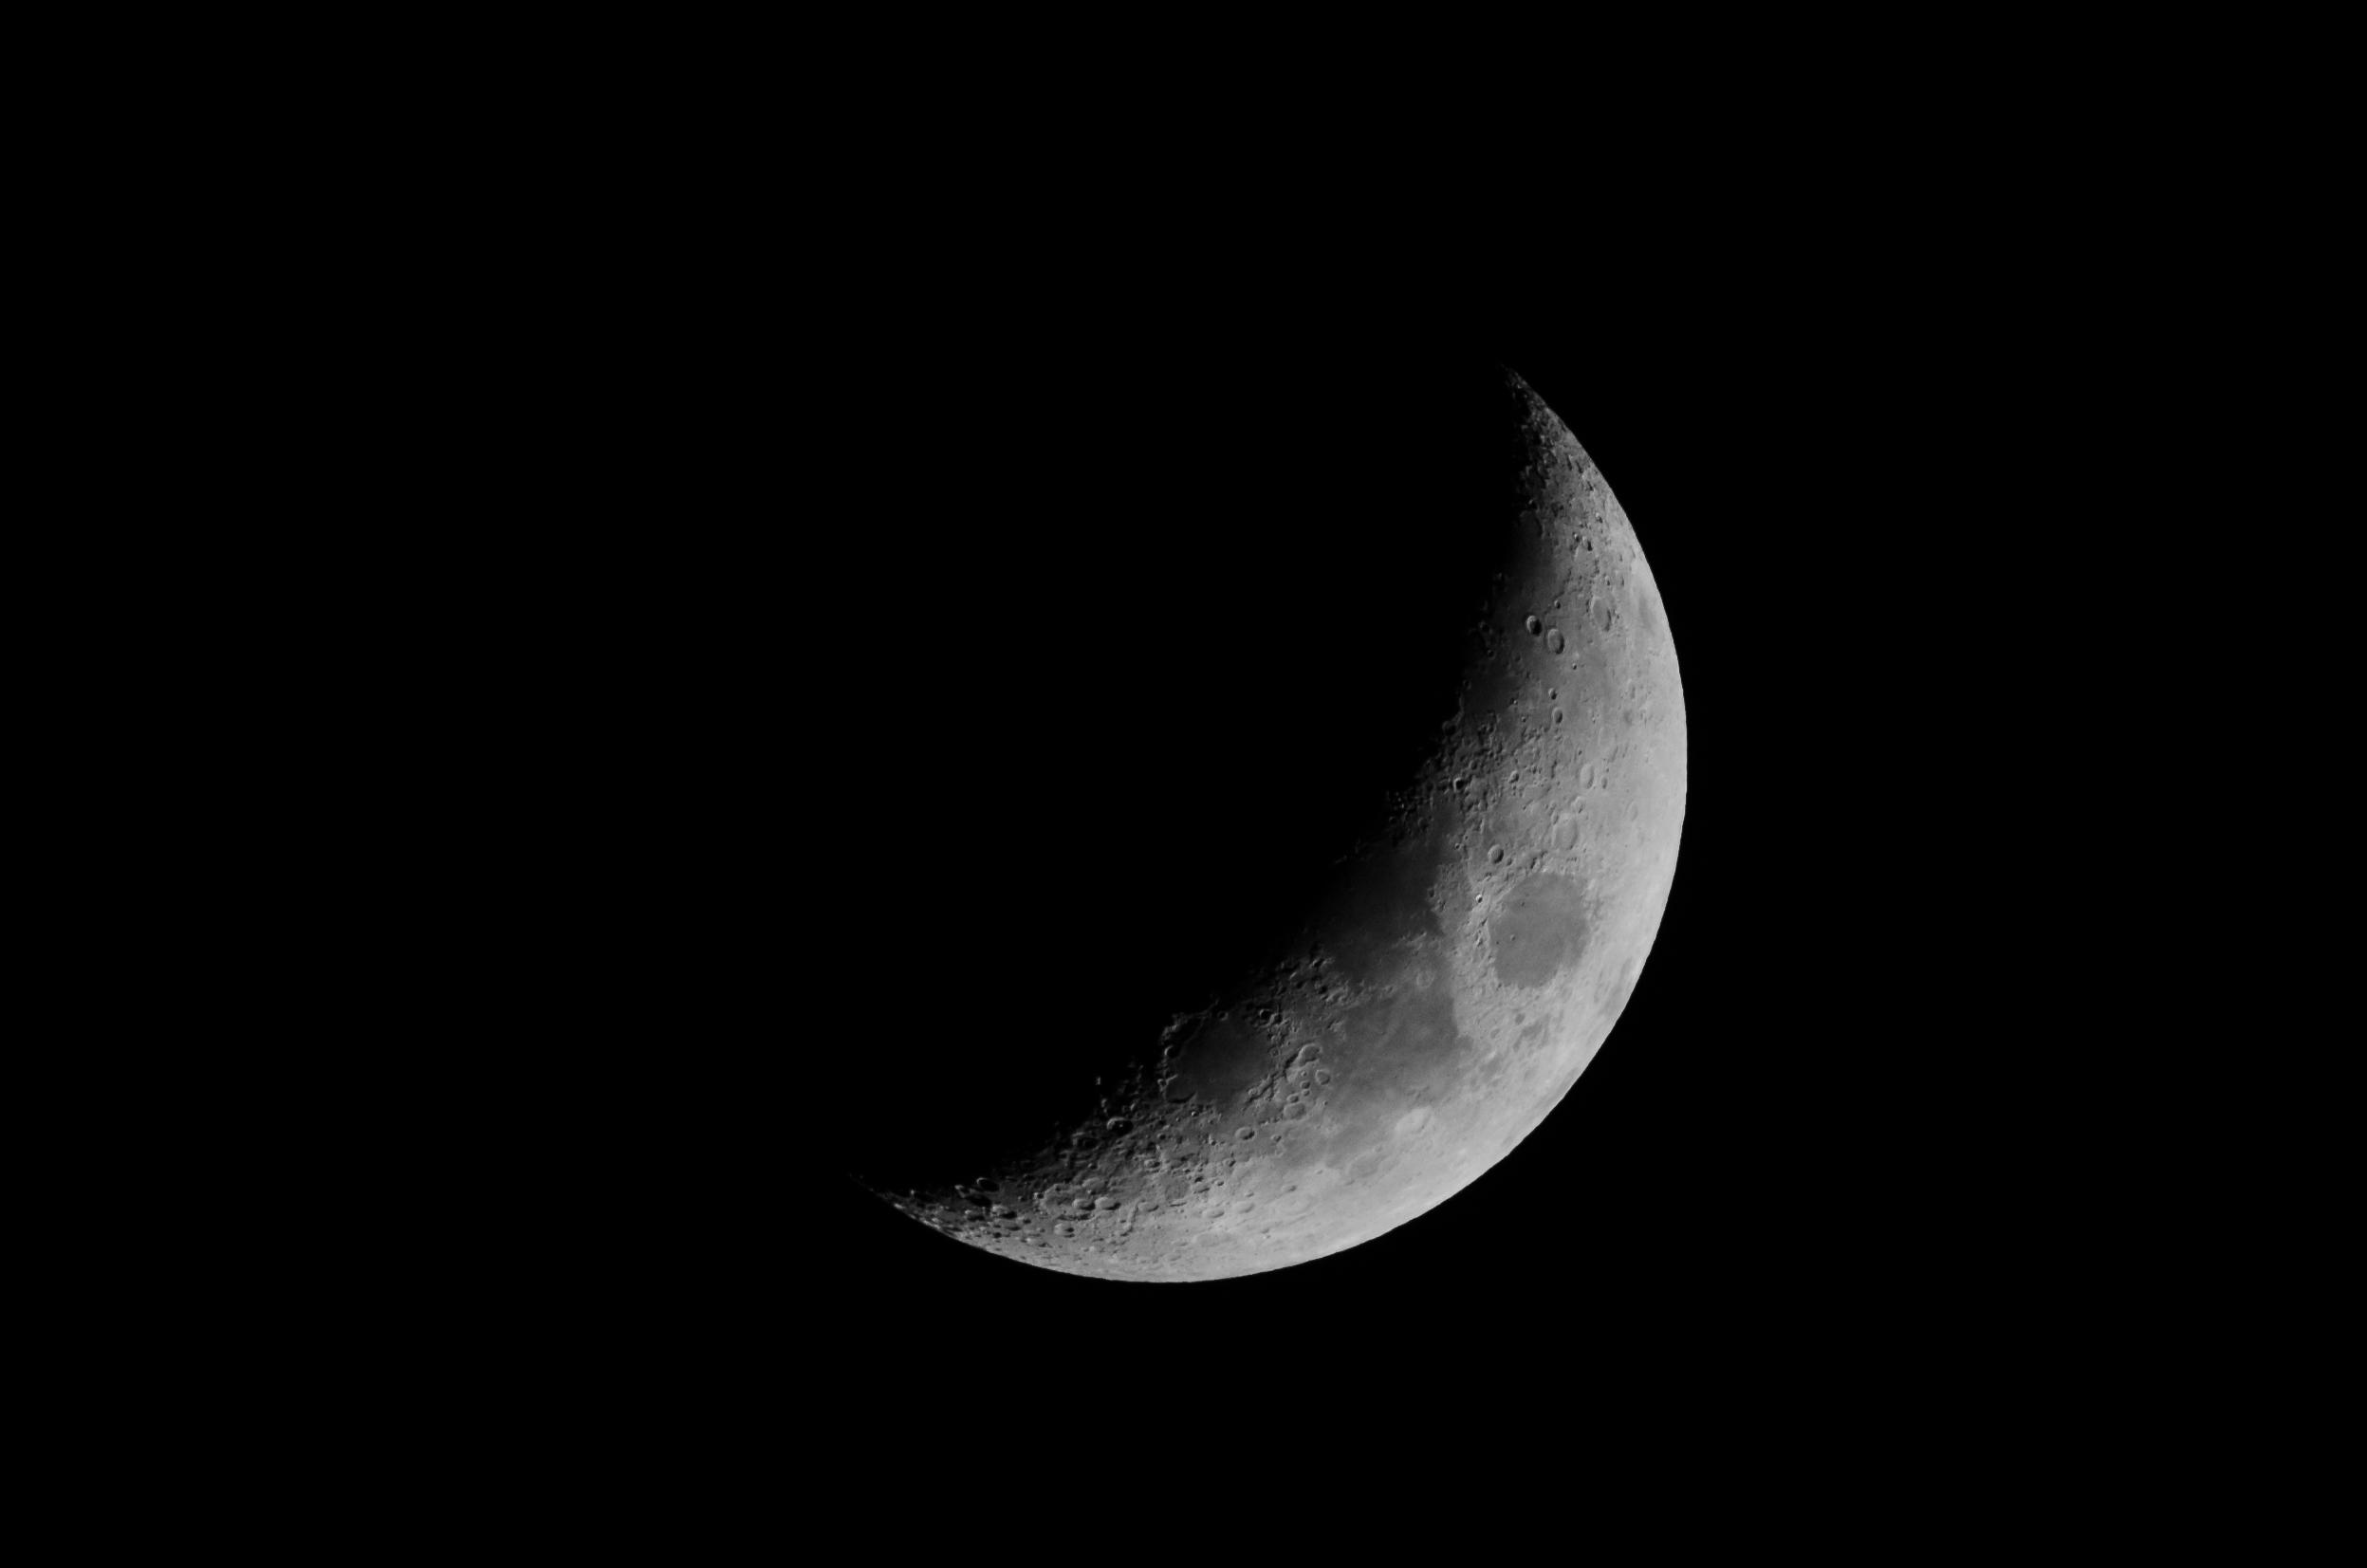 Waxing Moon  Nikon D7000 ISO 250 600mm f/10 1/250 sec